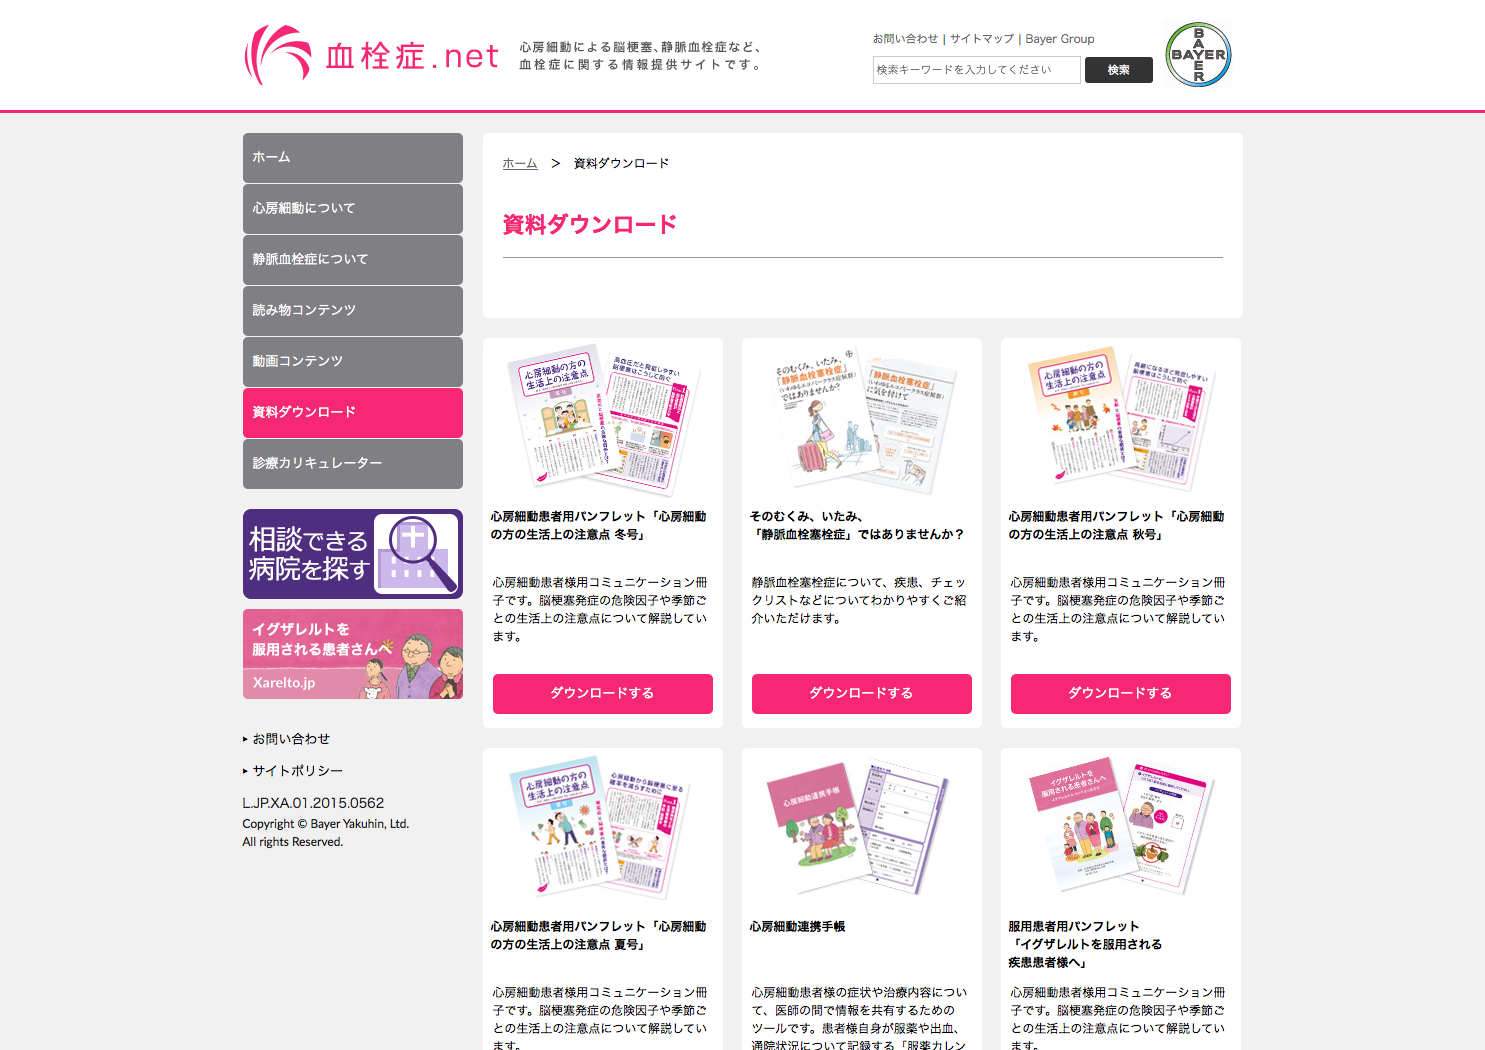 血栓症 .net  Official Website 2015